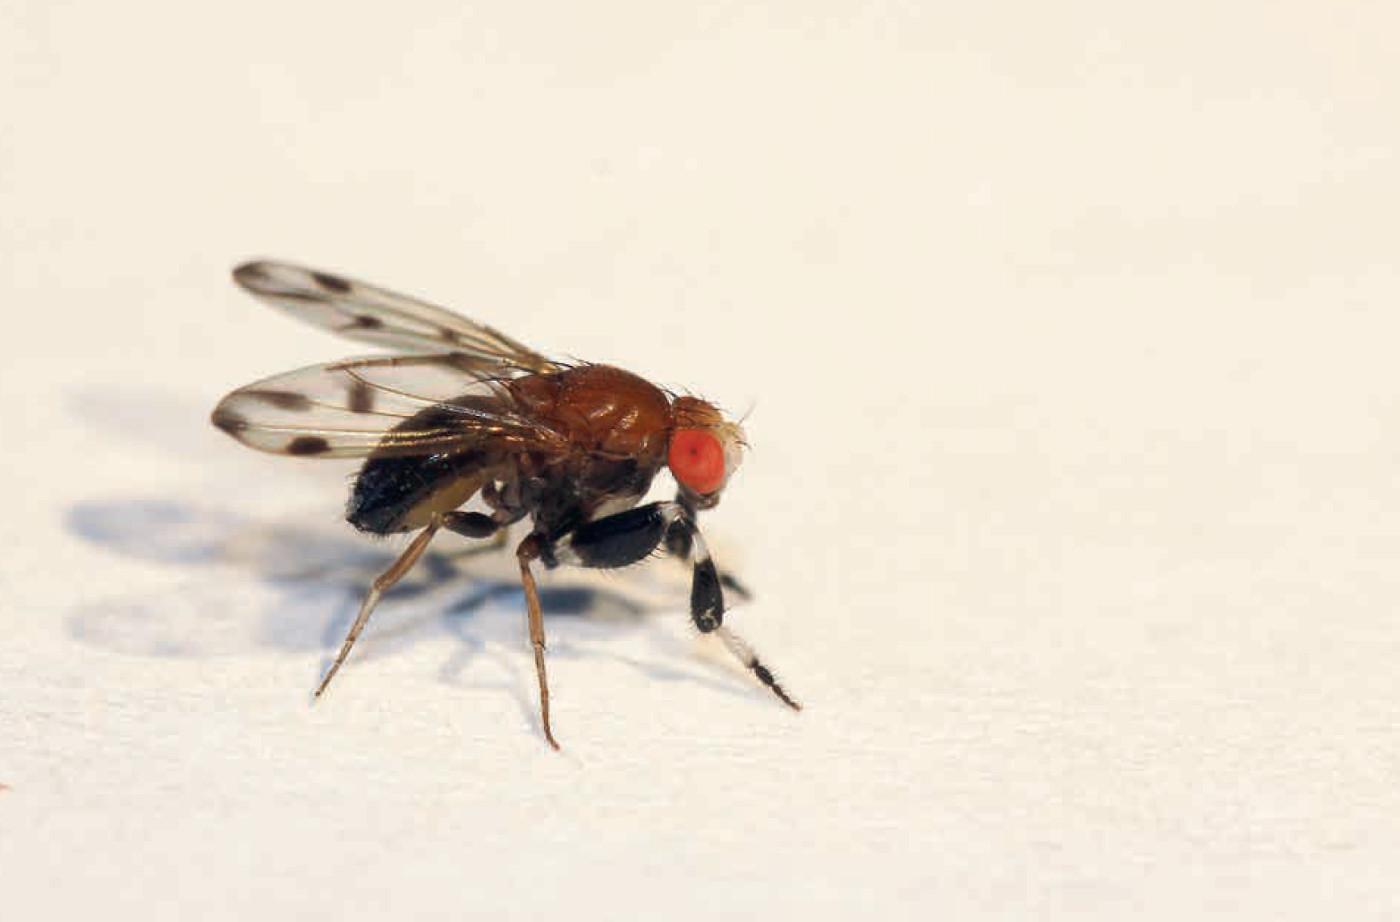 Sexual dimorphism in drosophila melanogaster